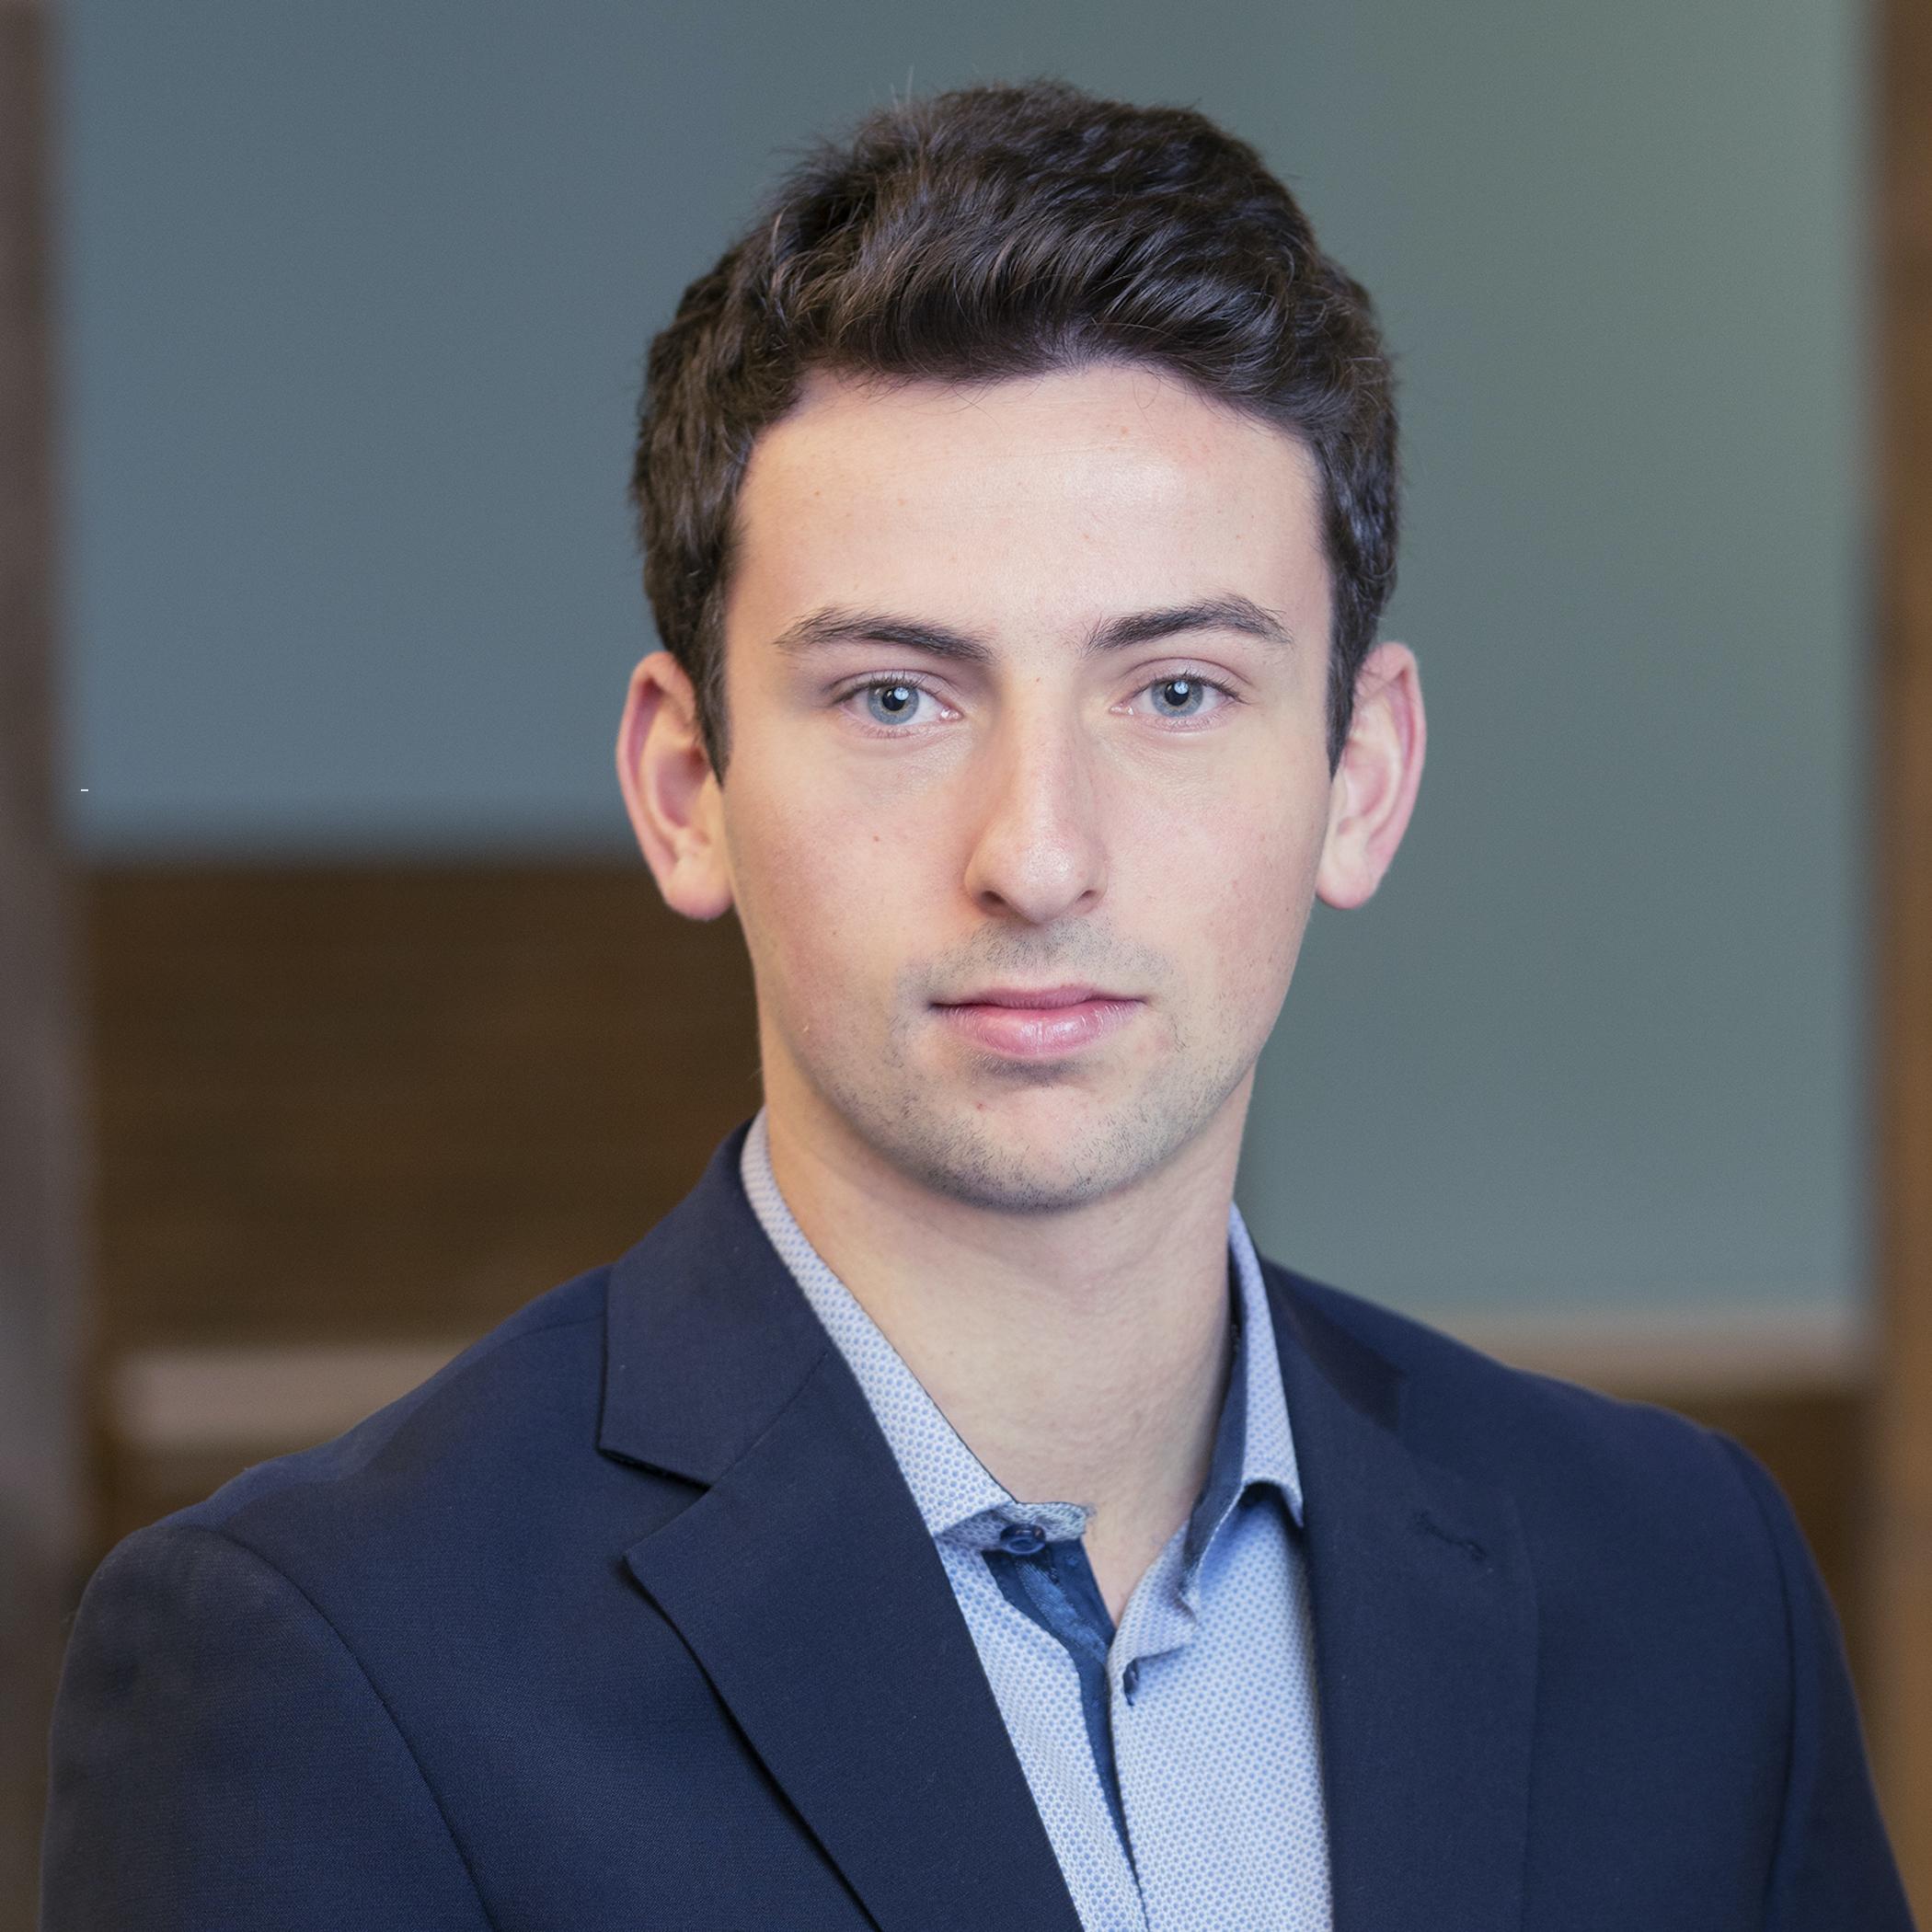 Jared Jenicek